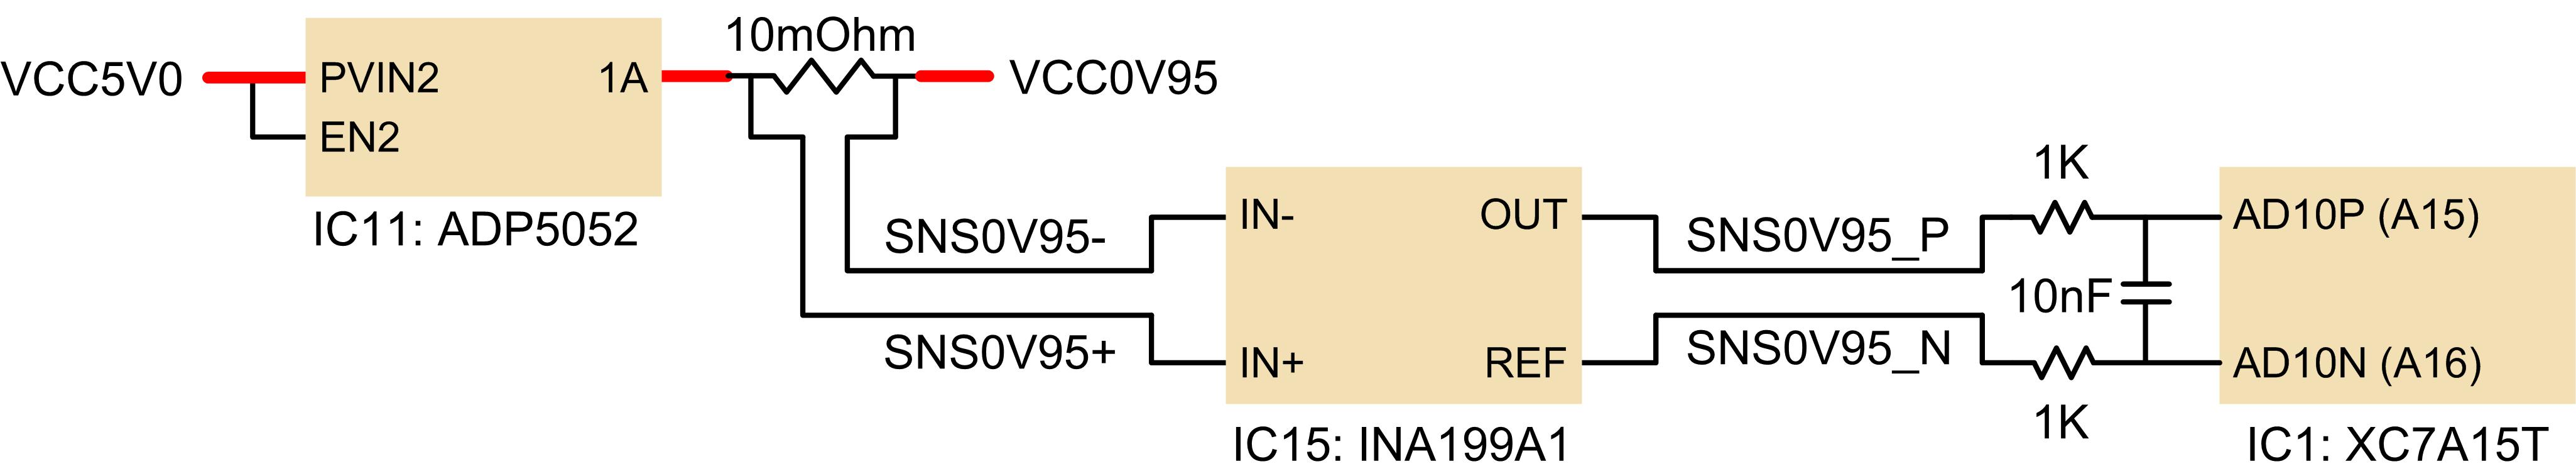 Figure 3.2.1. FPGA core supply current monitoring.